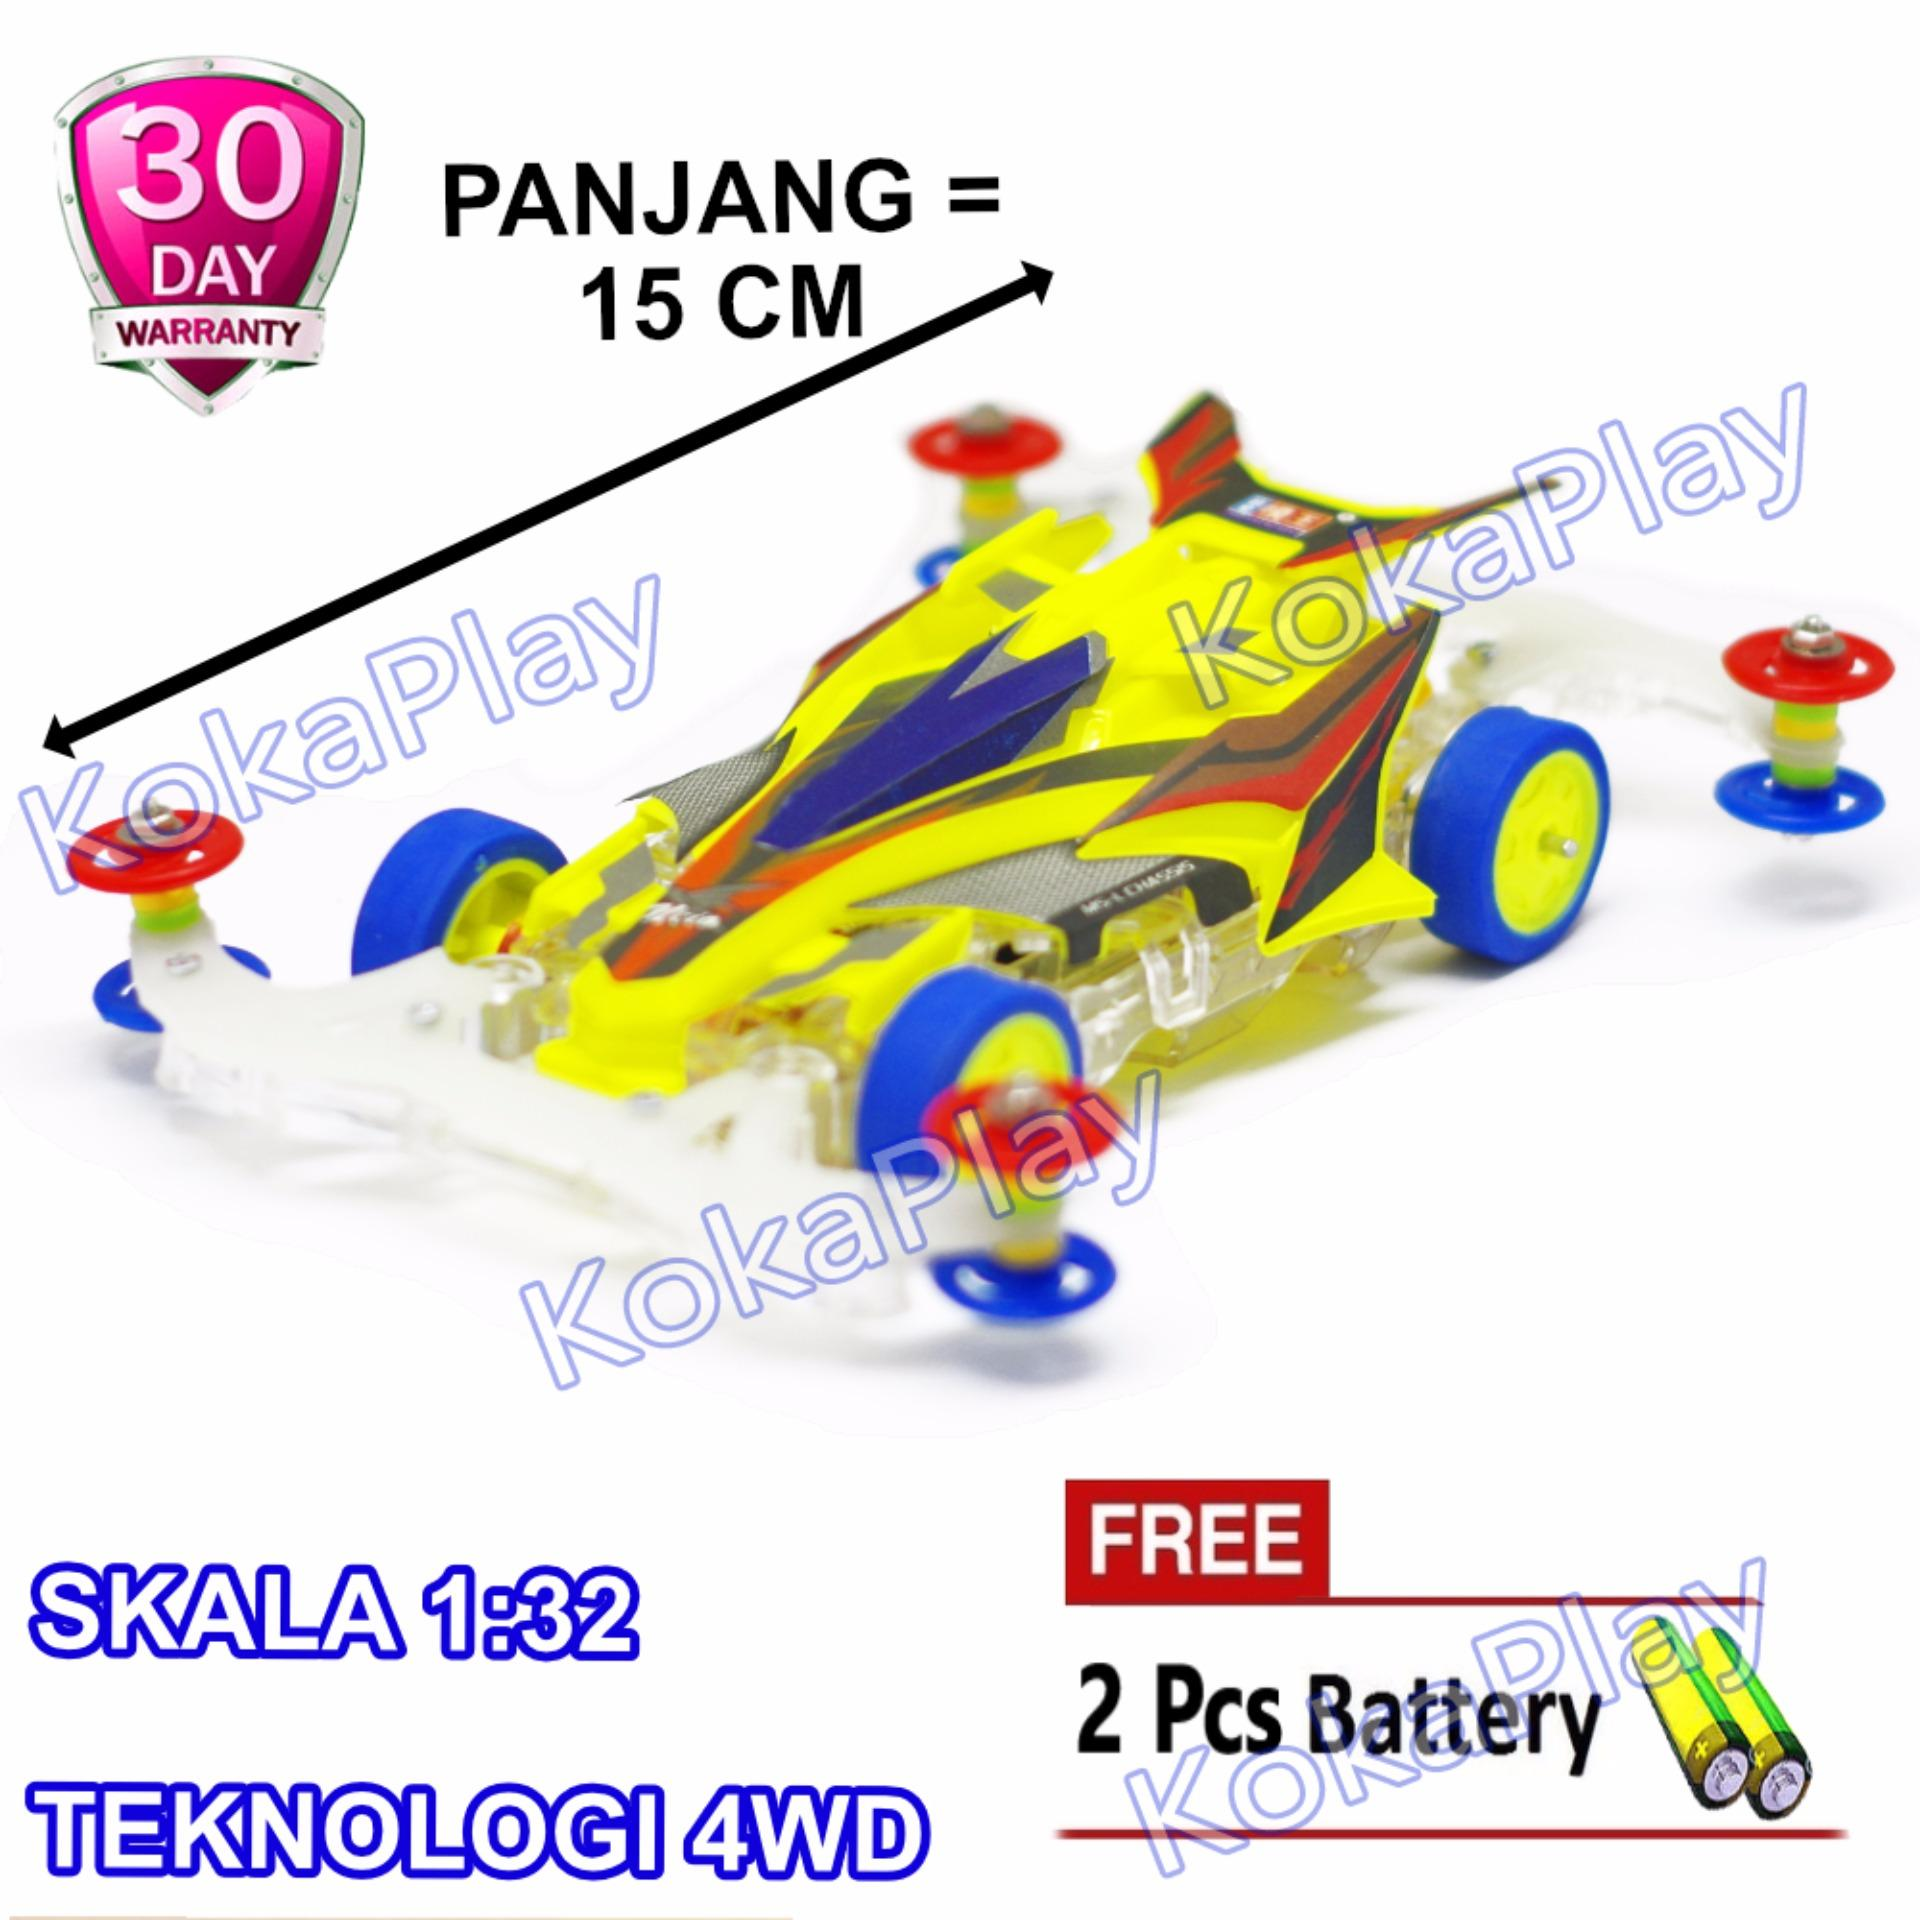 Spek Kokaplay Tamiya Fast Mini Racing Car Mini 4Wd Series Falcon Magnum Avante X Neio Manta Ray Mainan Anak Mobil Balap Track Tamiya 4Wd Free 2 Baterai Kokaplay